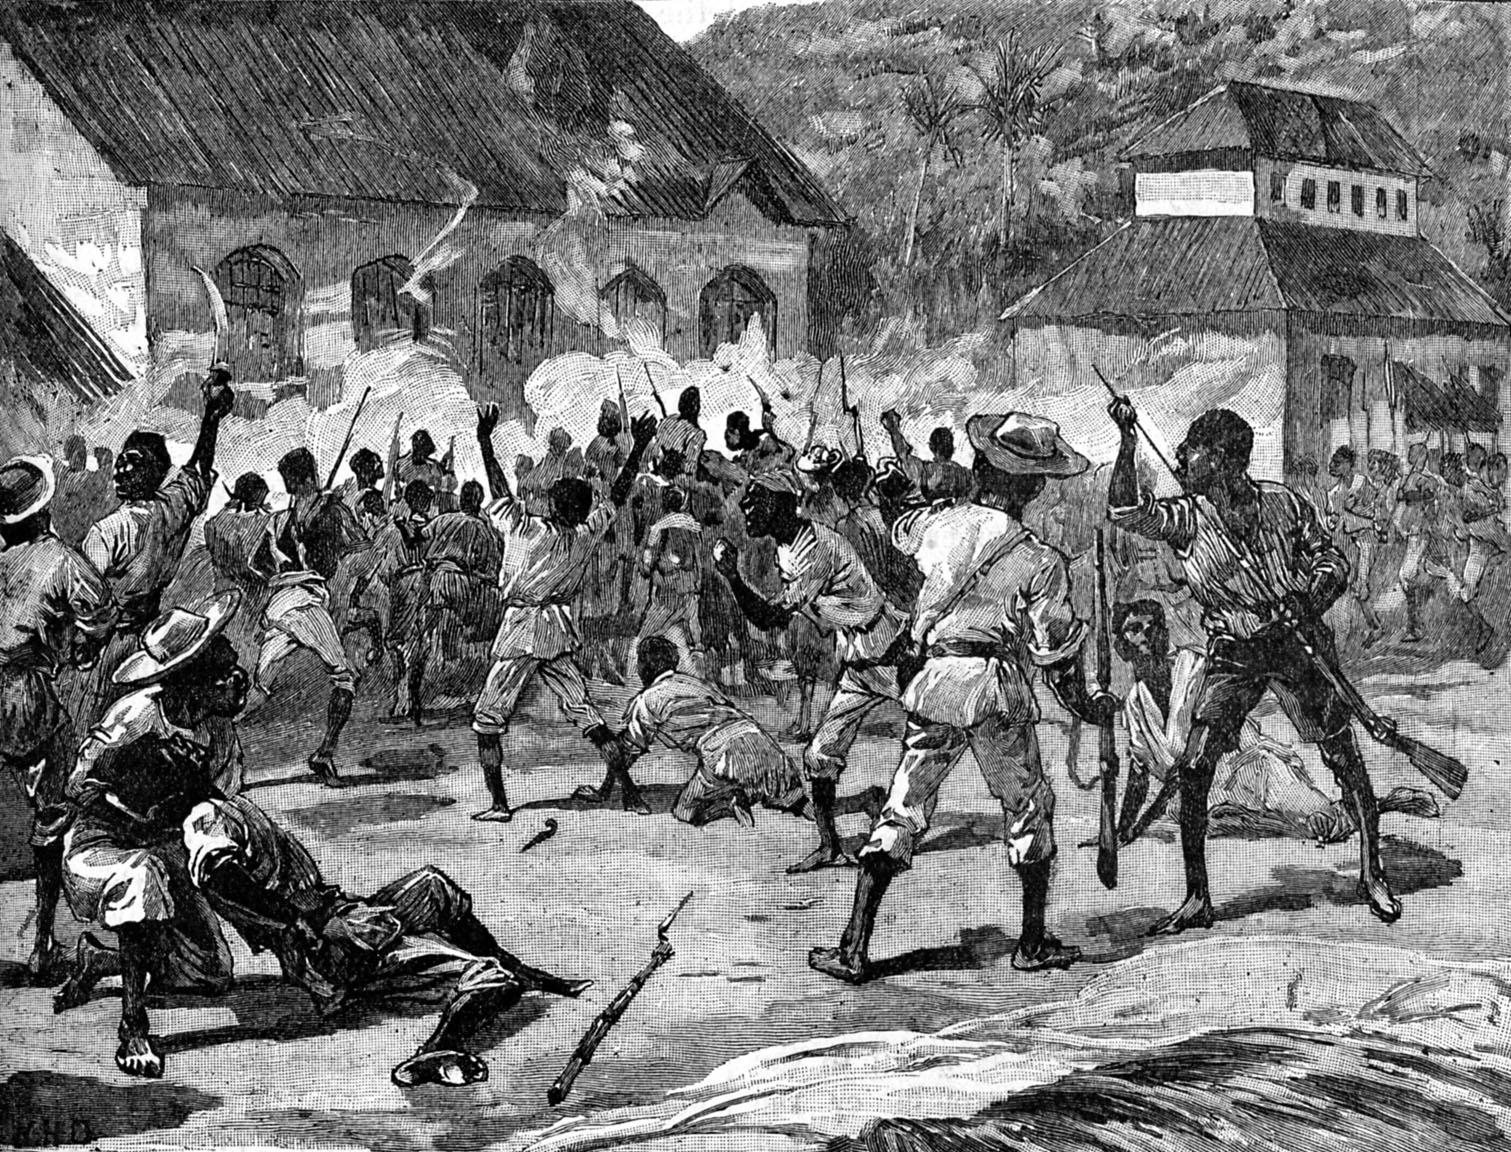 An illustration of the Morant Bay Rebellion of 1865